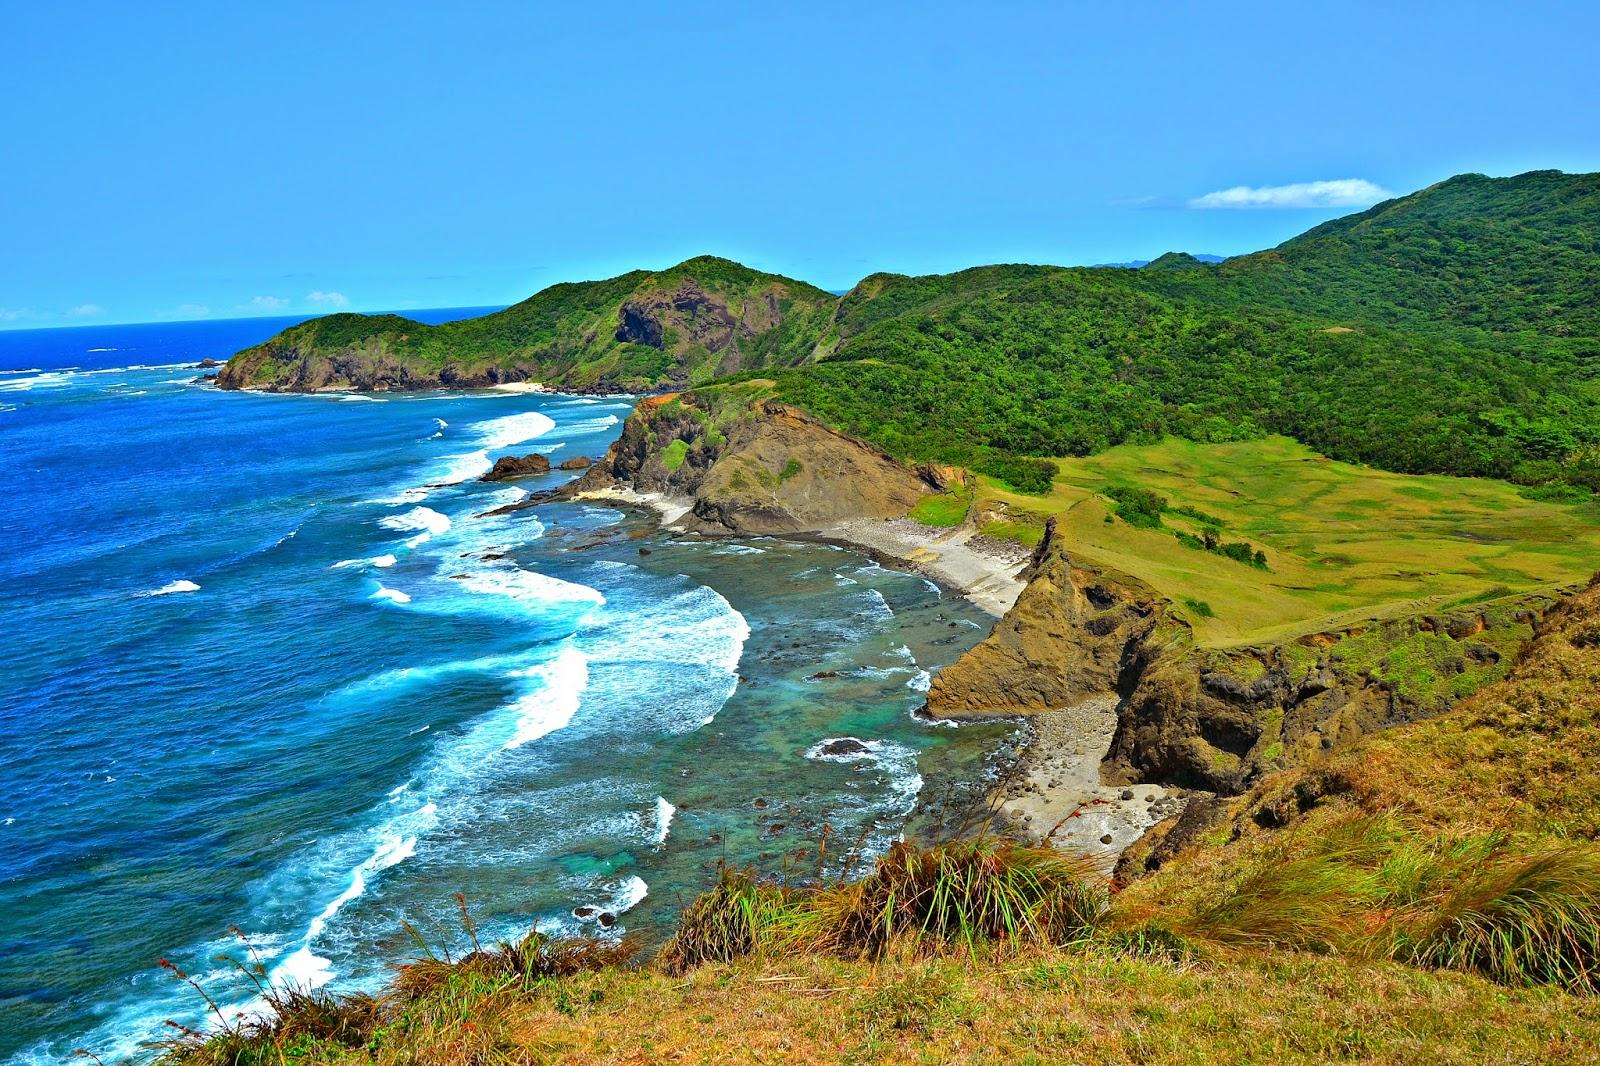 Cagayan Adventure: Palaui Island